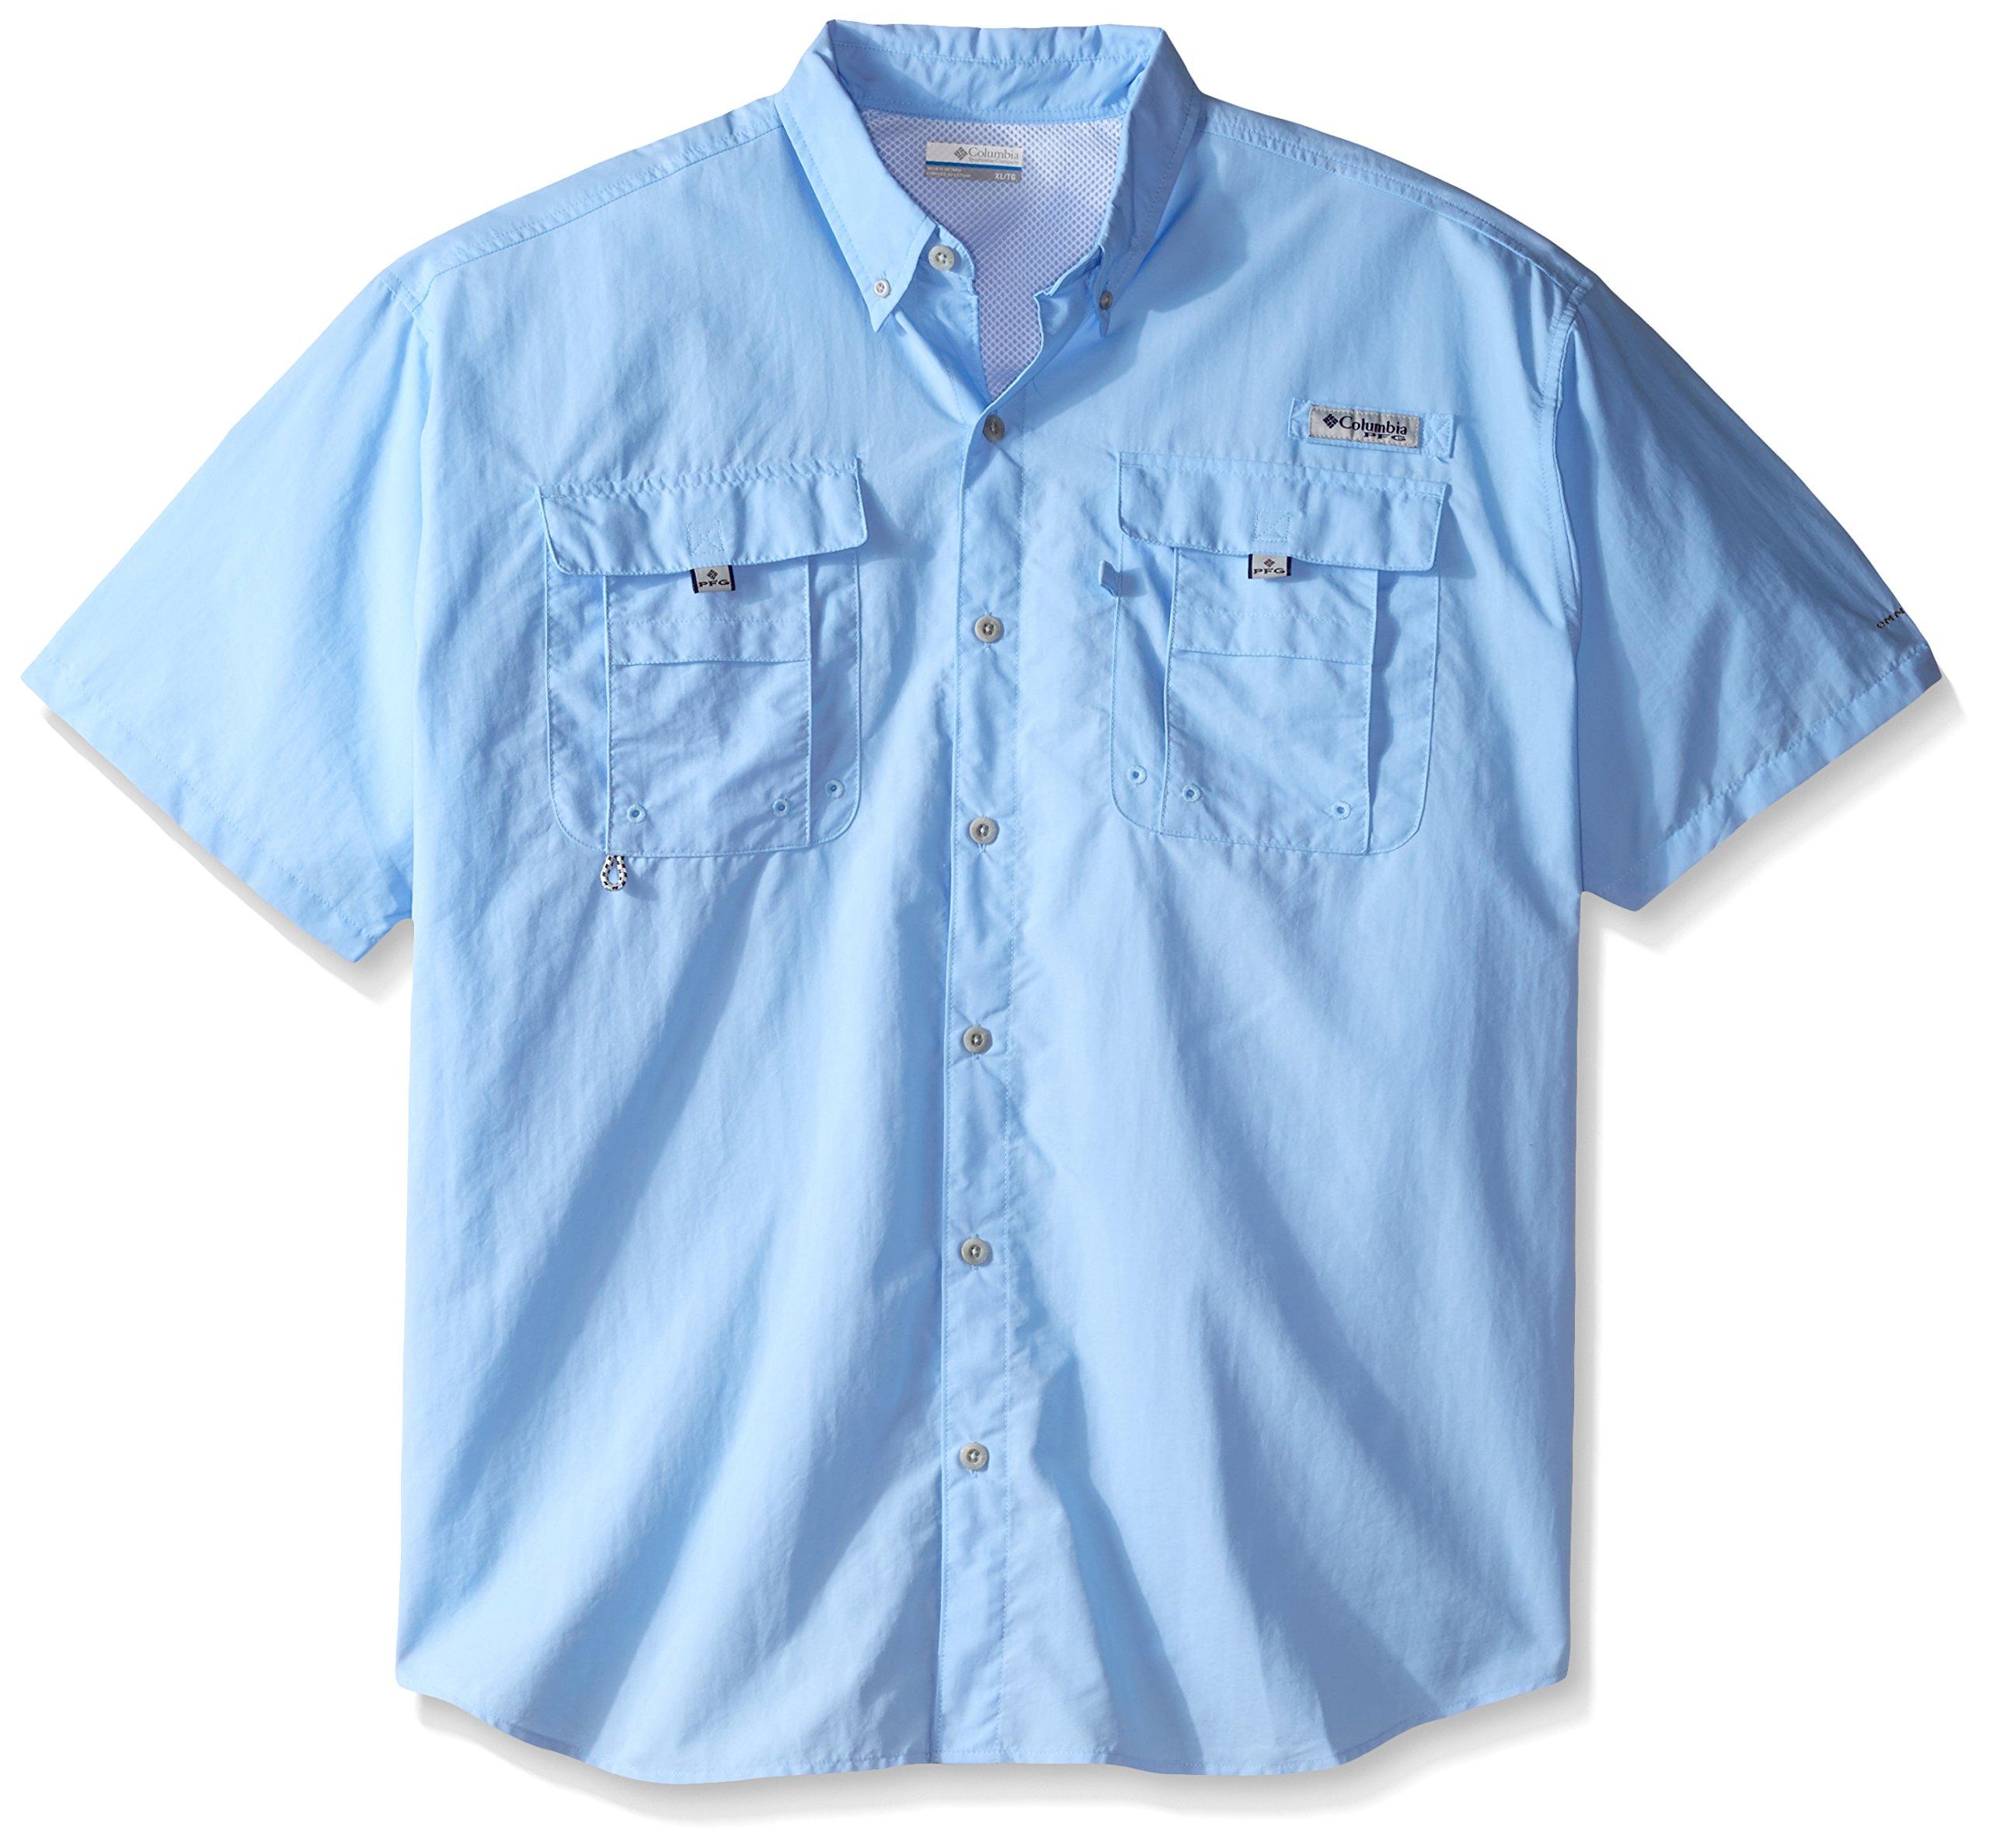 Columbia Men's Bahama II Short Sleeve Fishing Shirt (Sail, 2XT)